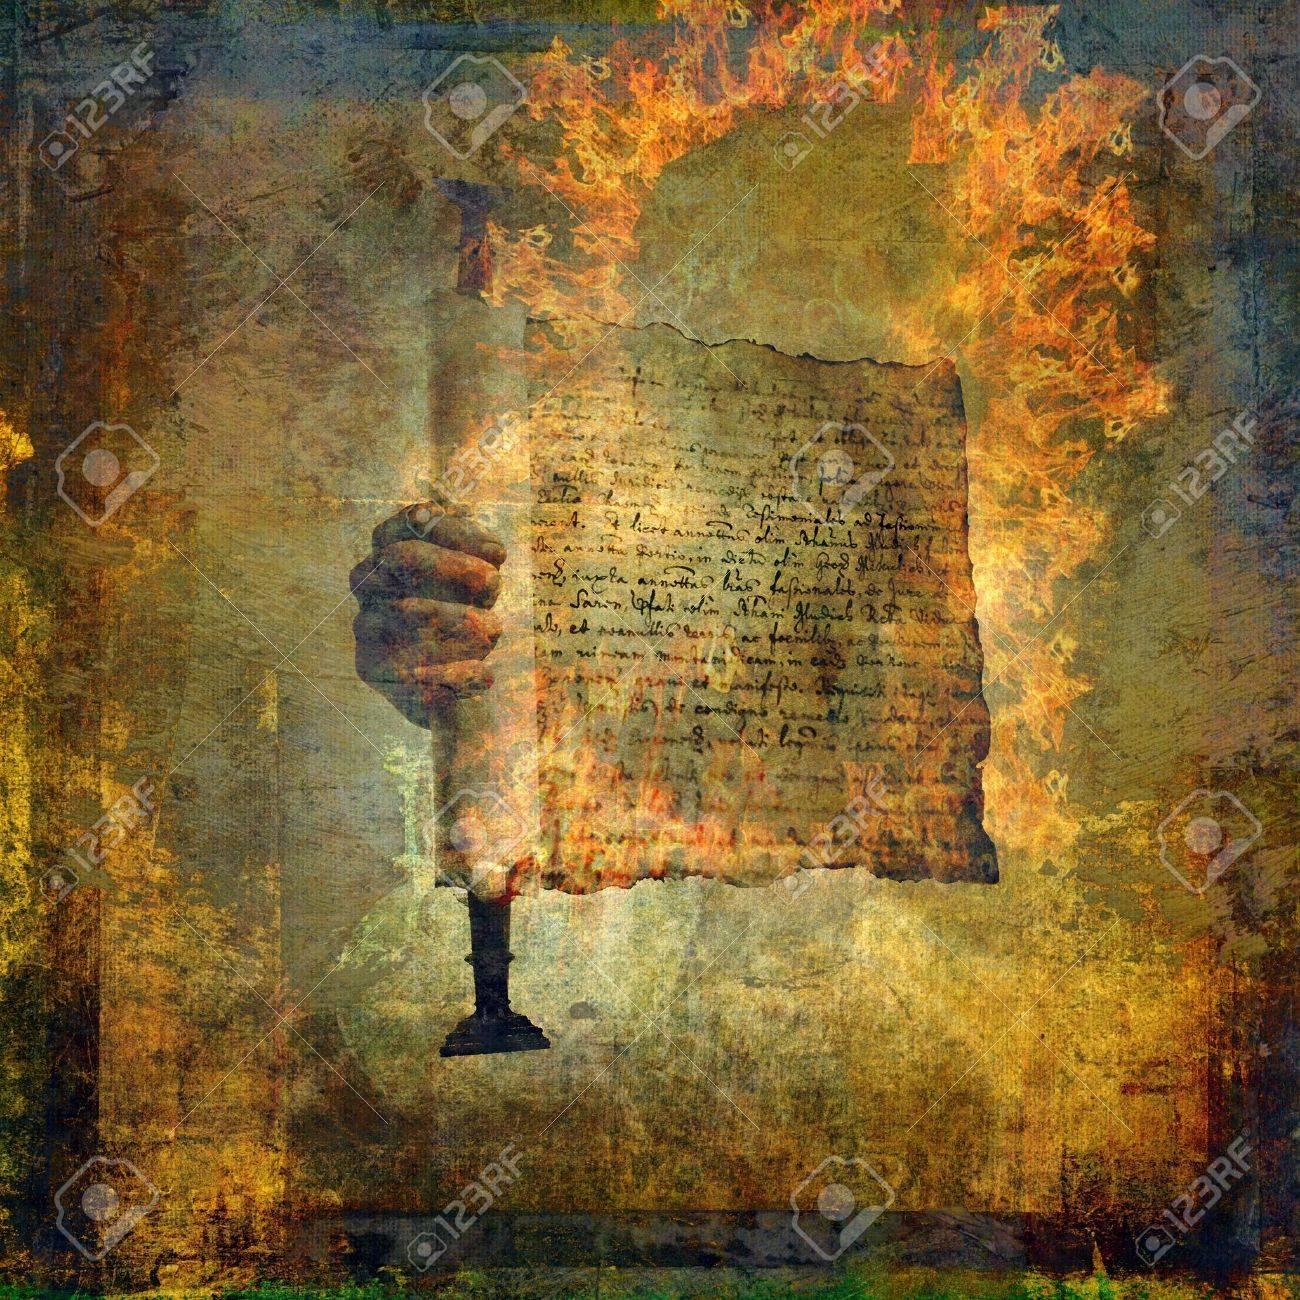 Hand holding a burning scroll. Photo based illustration. - 5169119